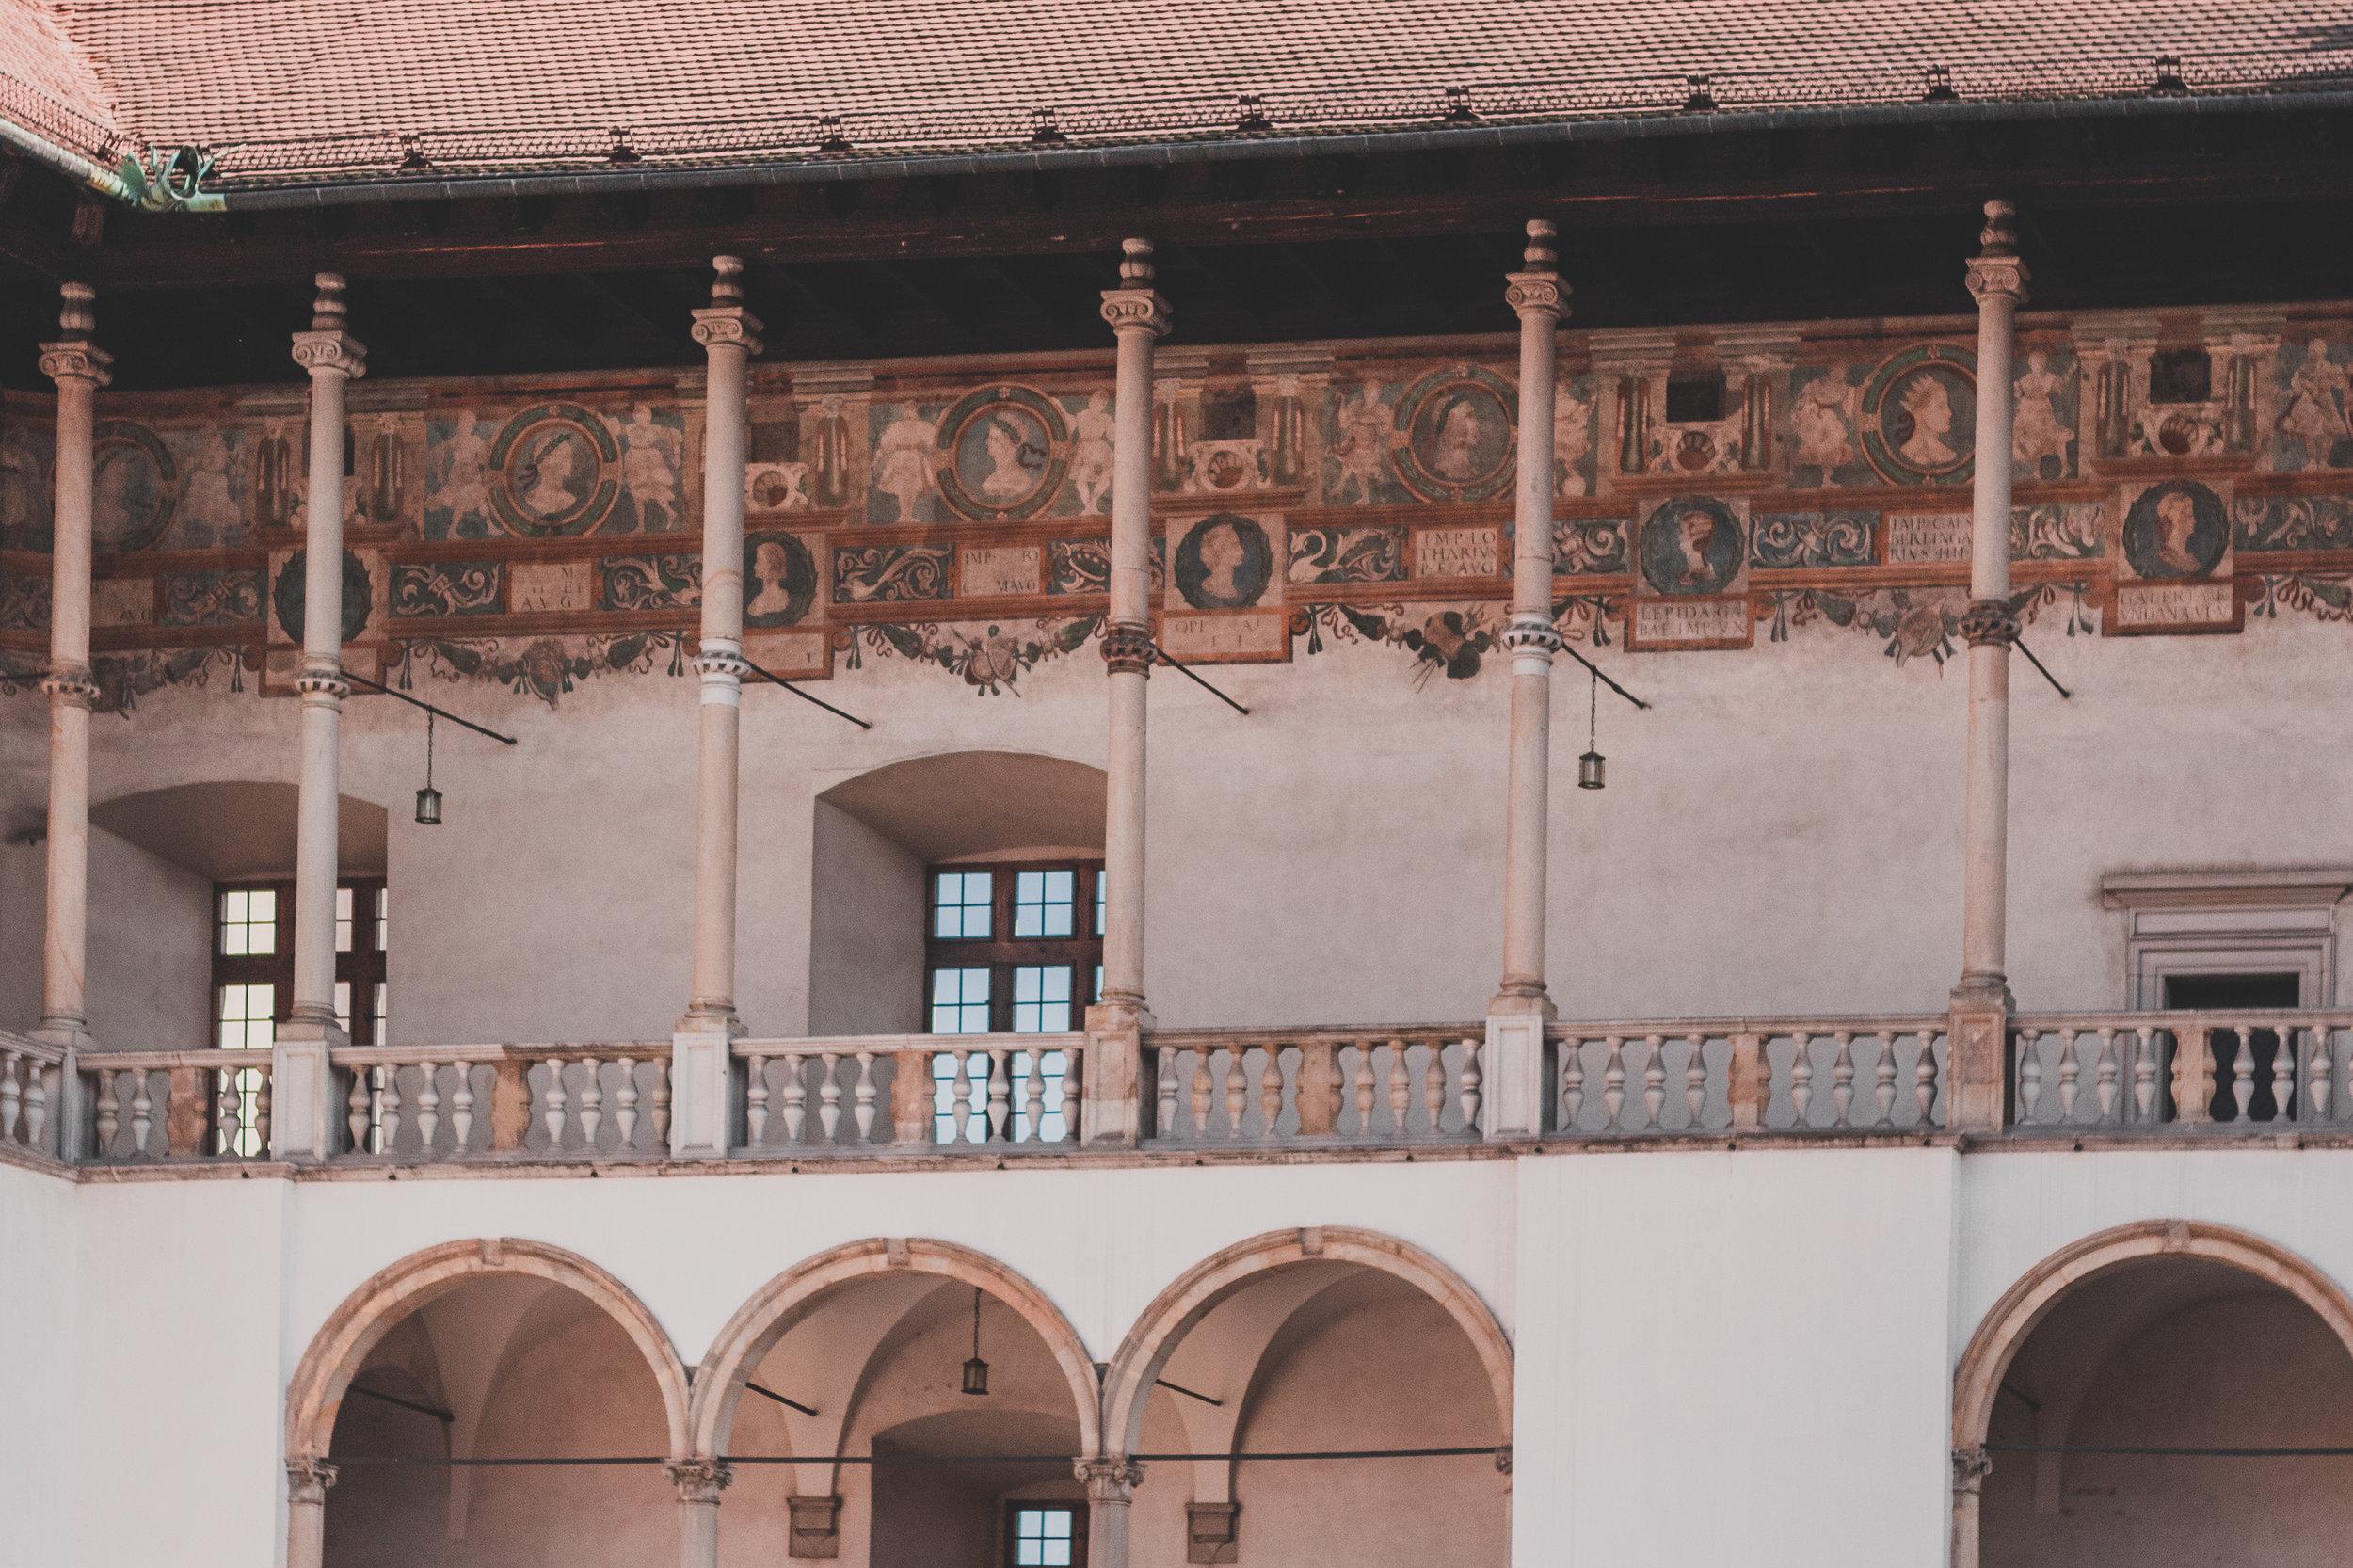 Poland+Krakow+to do+guide+university